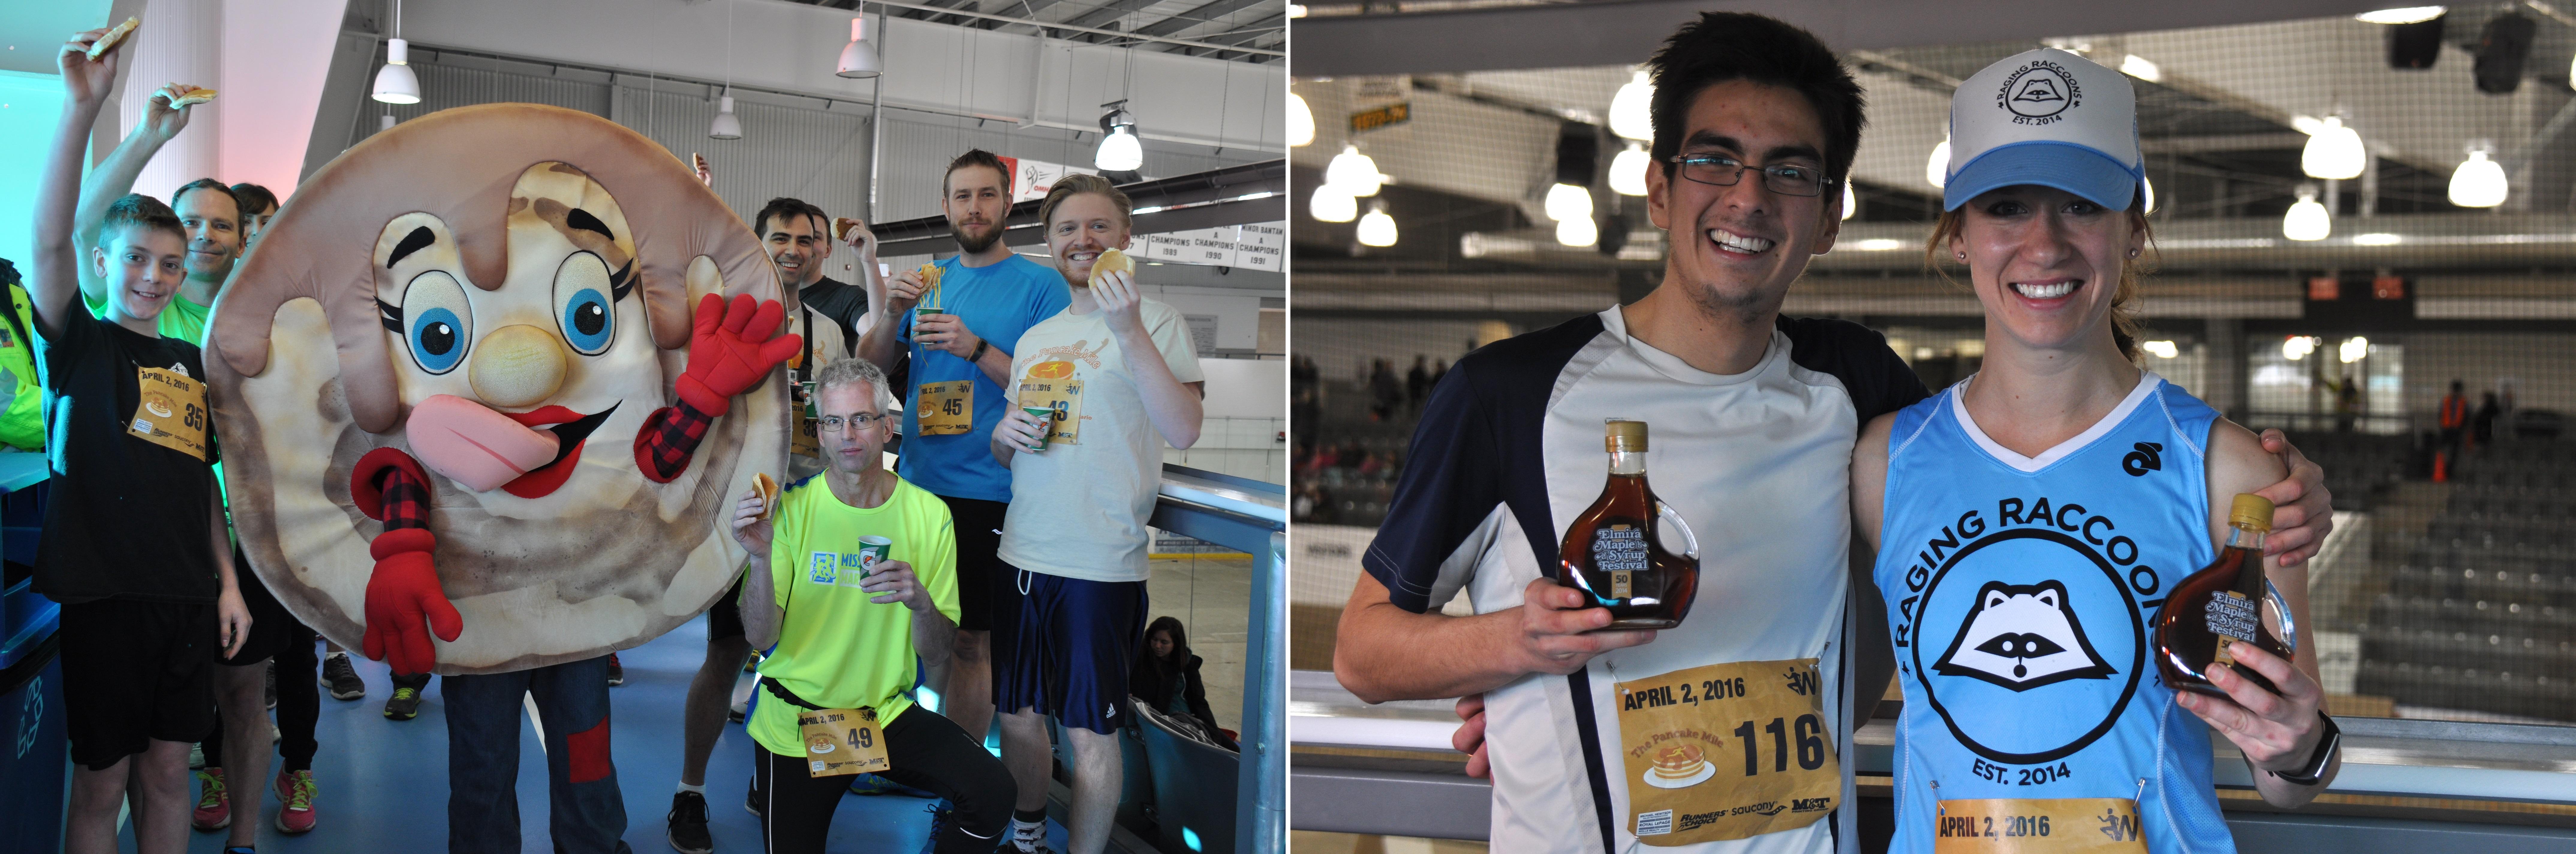 Pancake Mile, Elmira Maple Syrup Festival